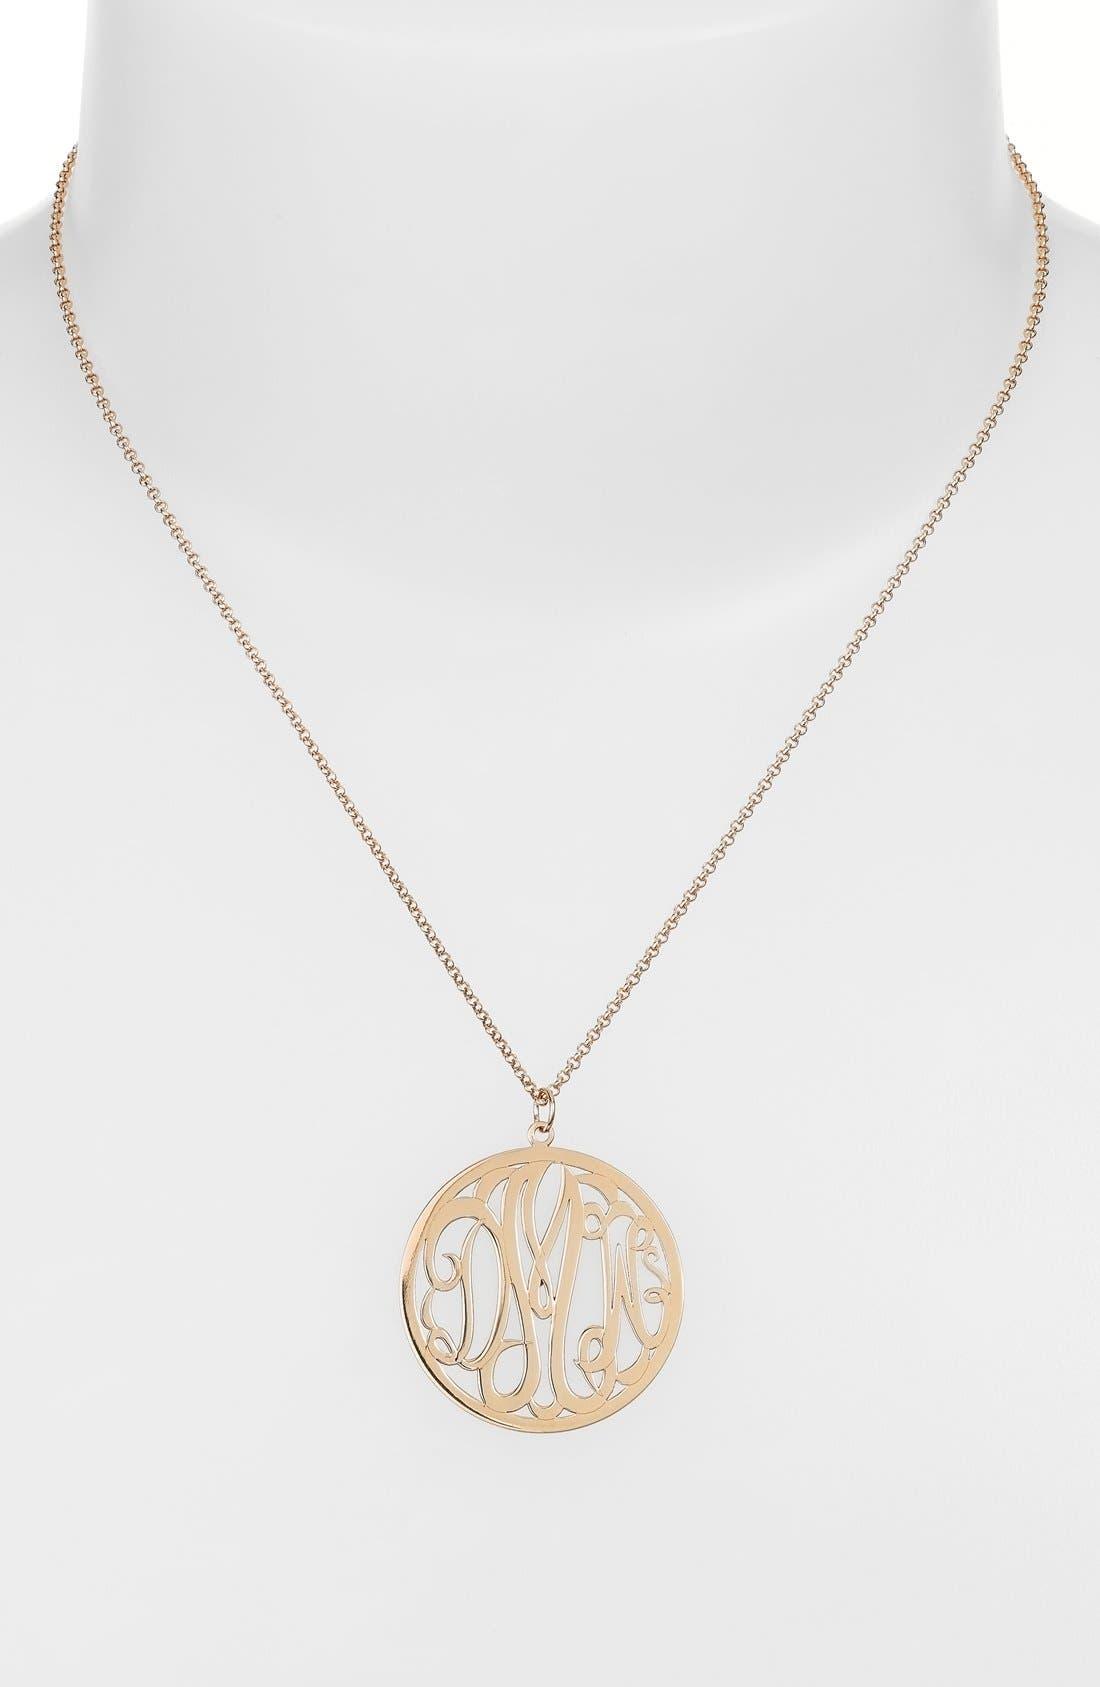 Personalized 3-Letter Monogram Necklace,                             Alternate thumbnail 2, color,                             GOLD